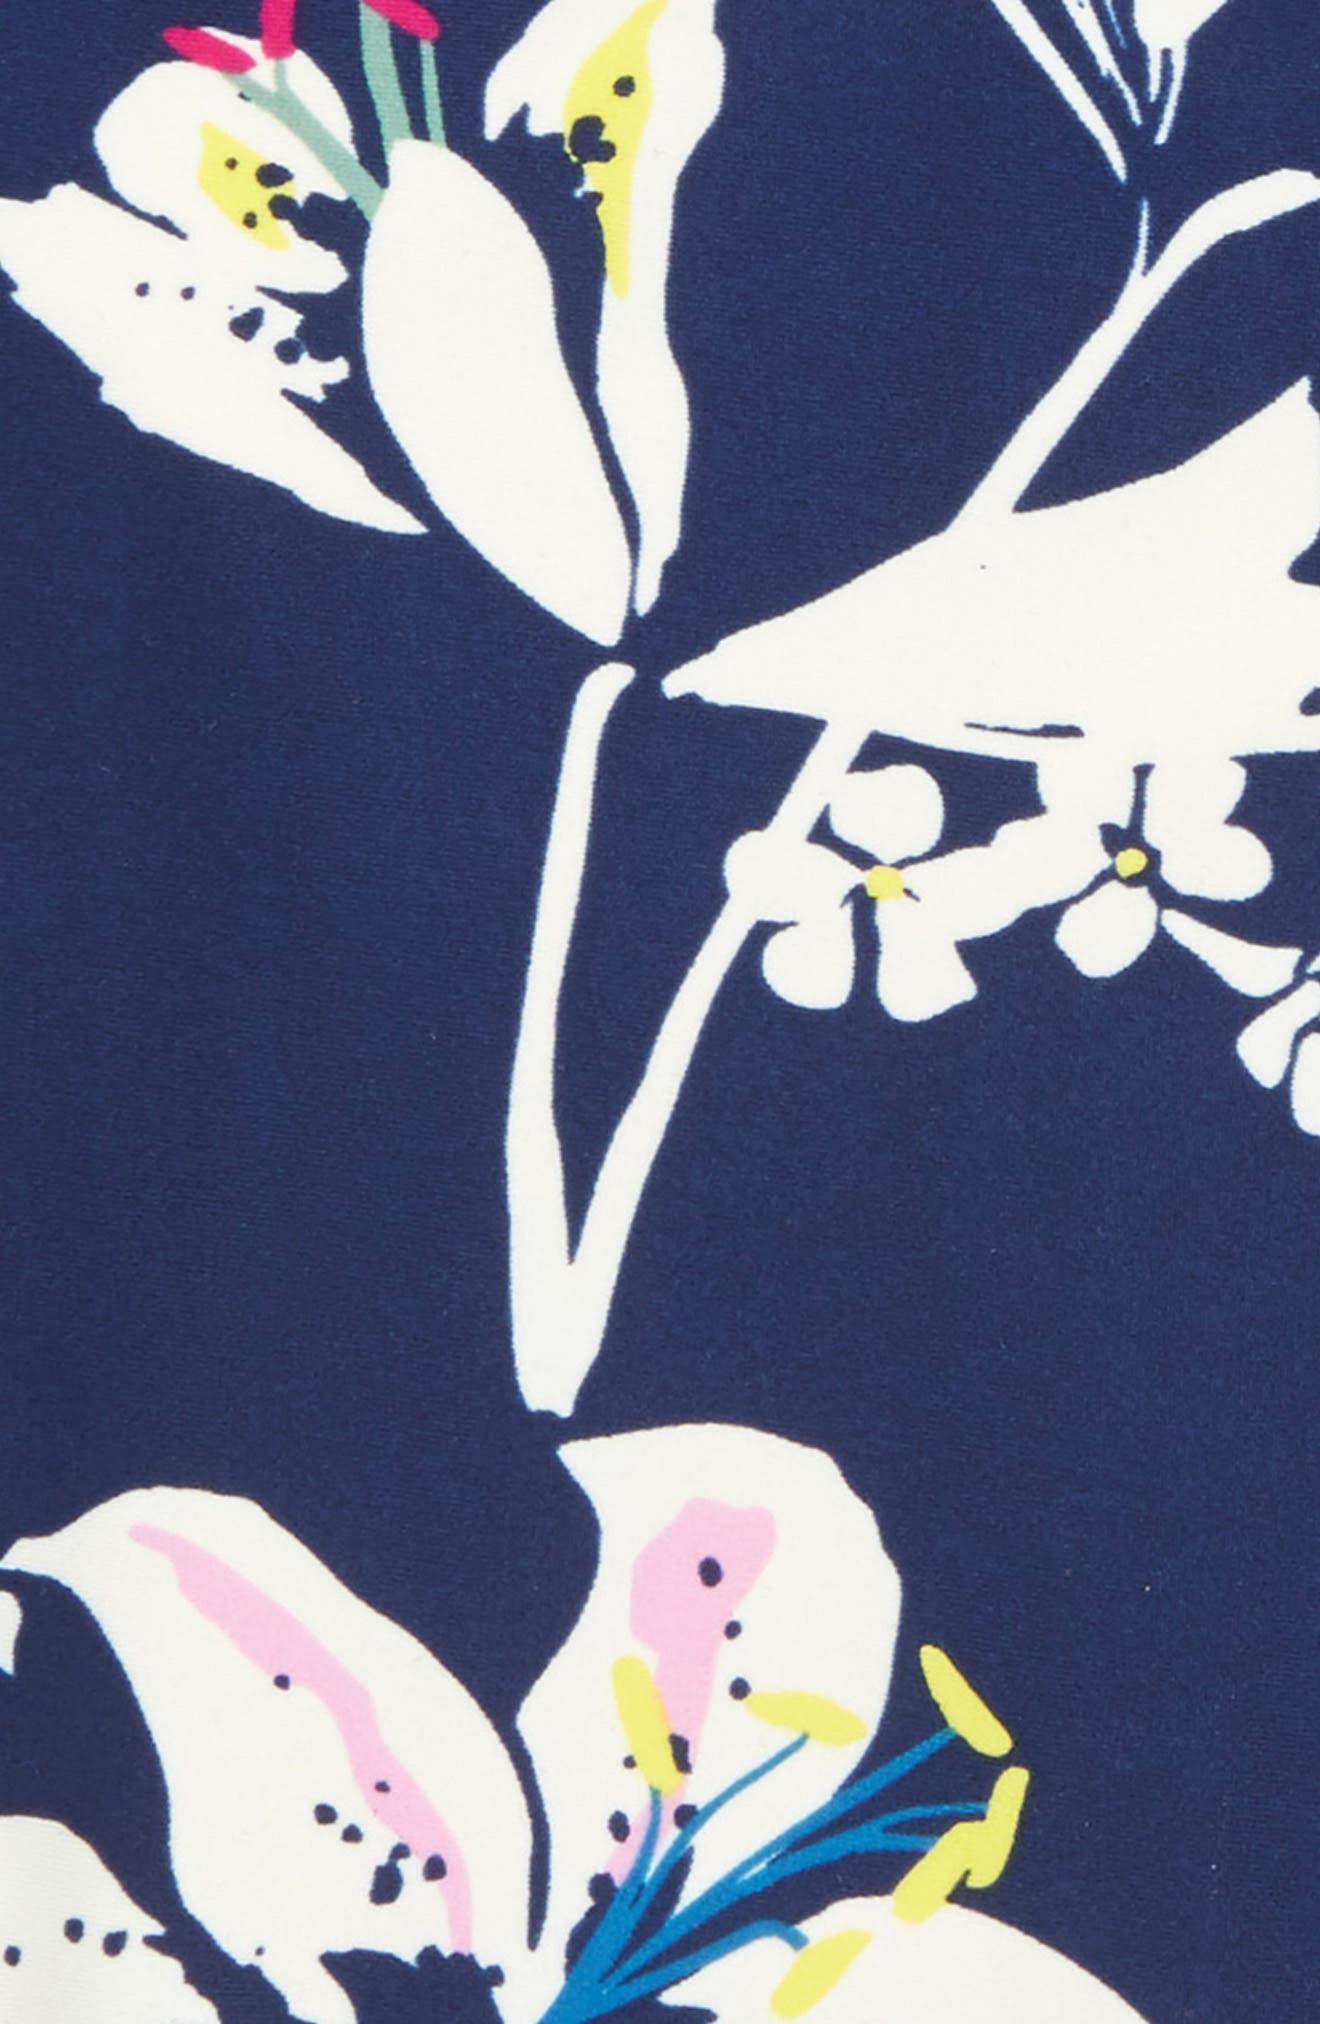 Tropical Lilies One-Piece Swimsuit,                             Alternate thumbnail 3, color,                             TROPICAL LILLIES